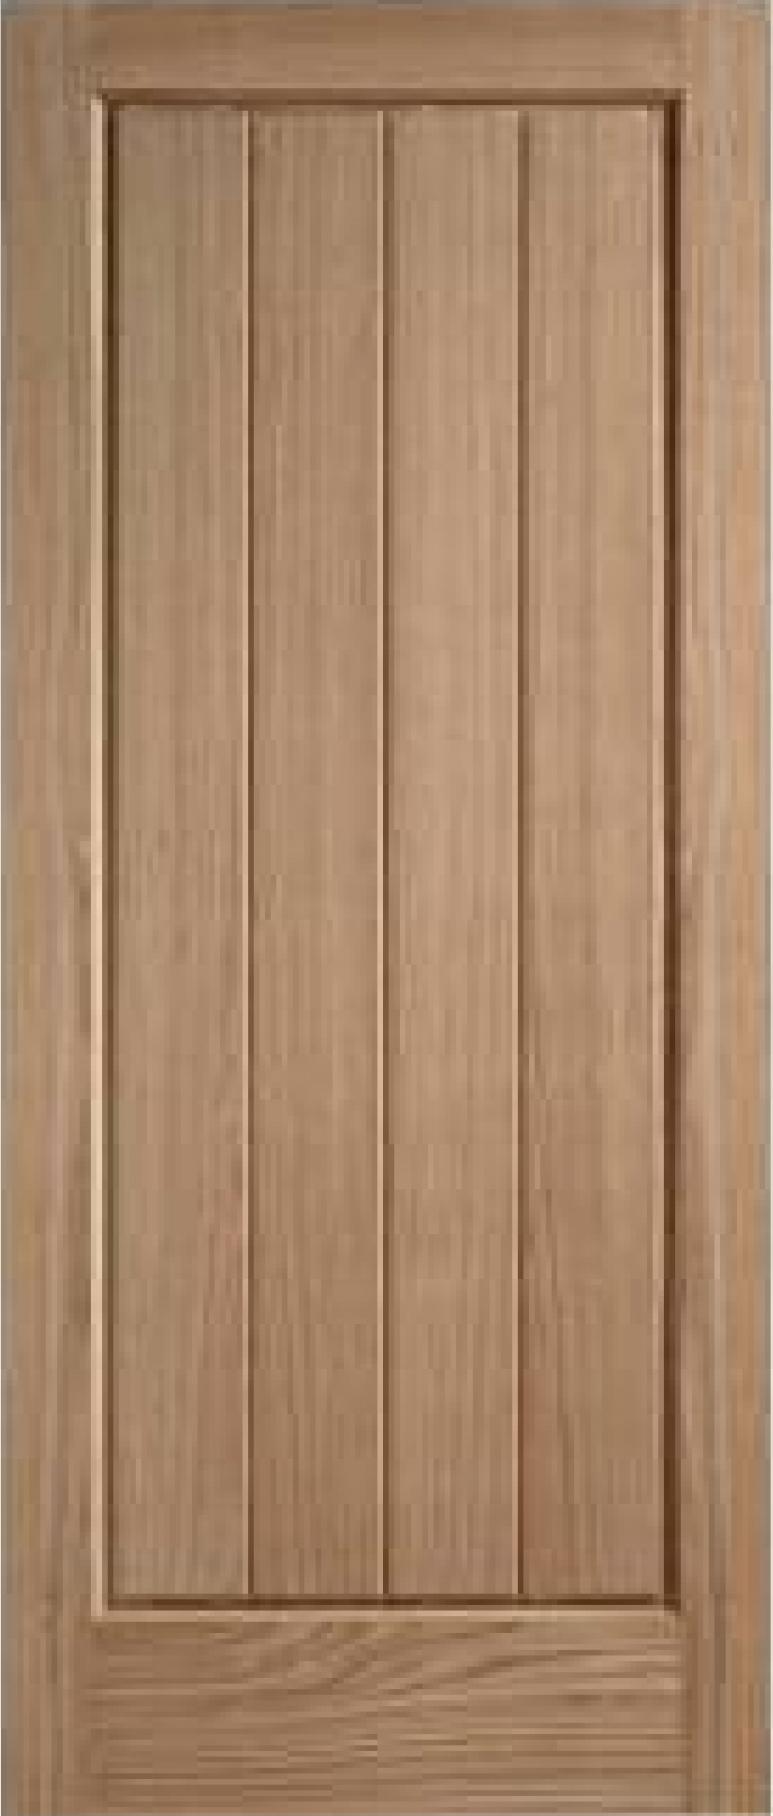 Epsom Oak External Doors From Vibrant Doors